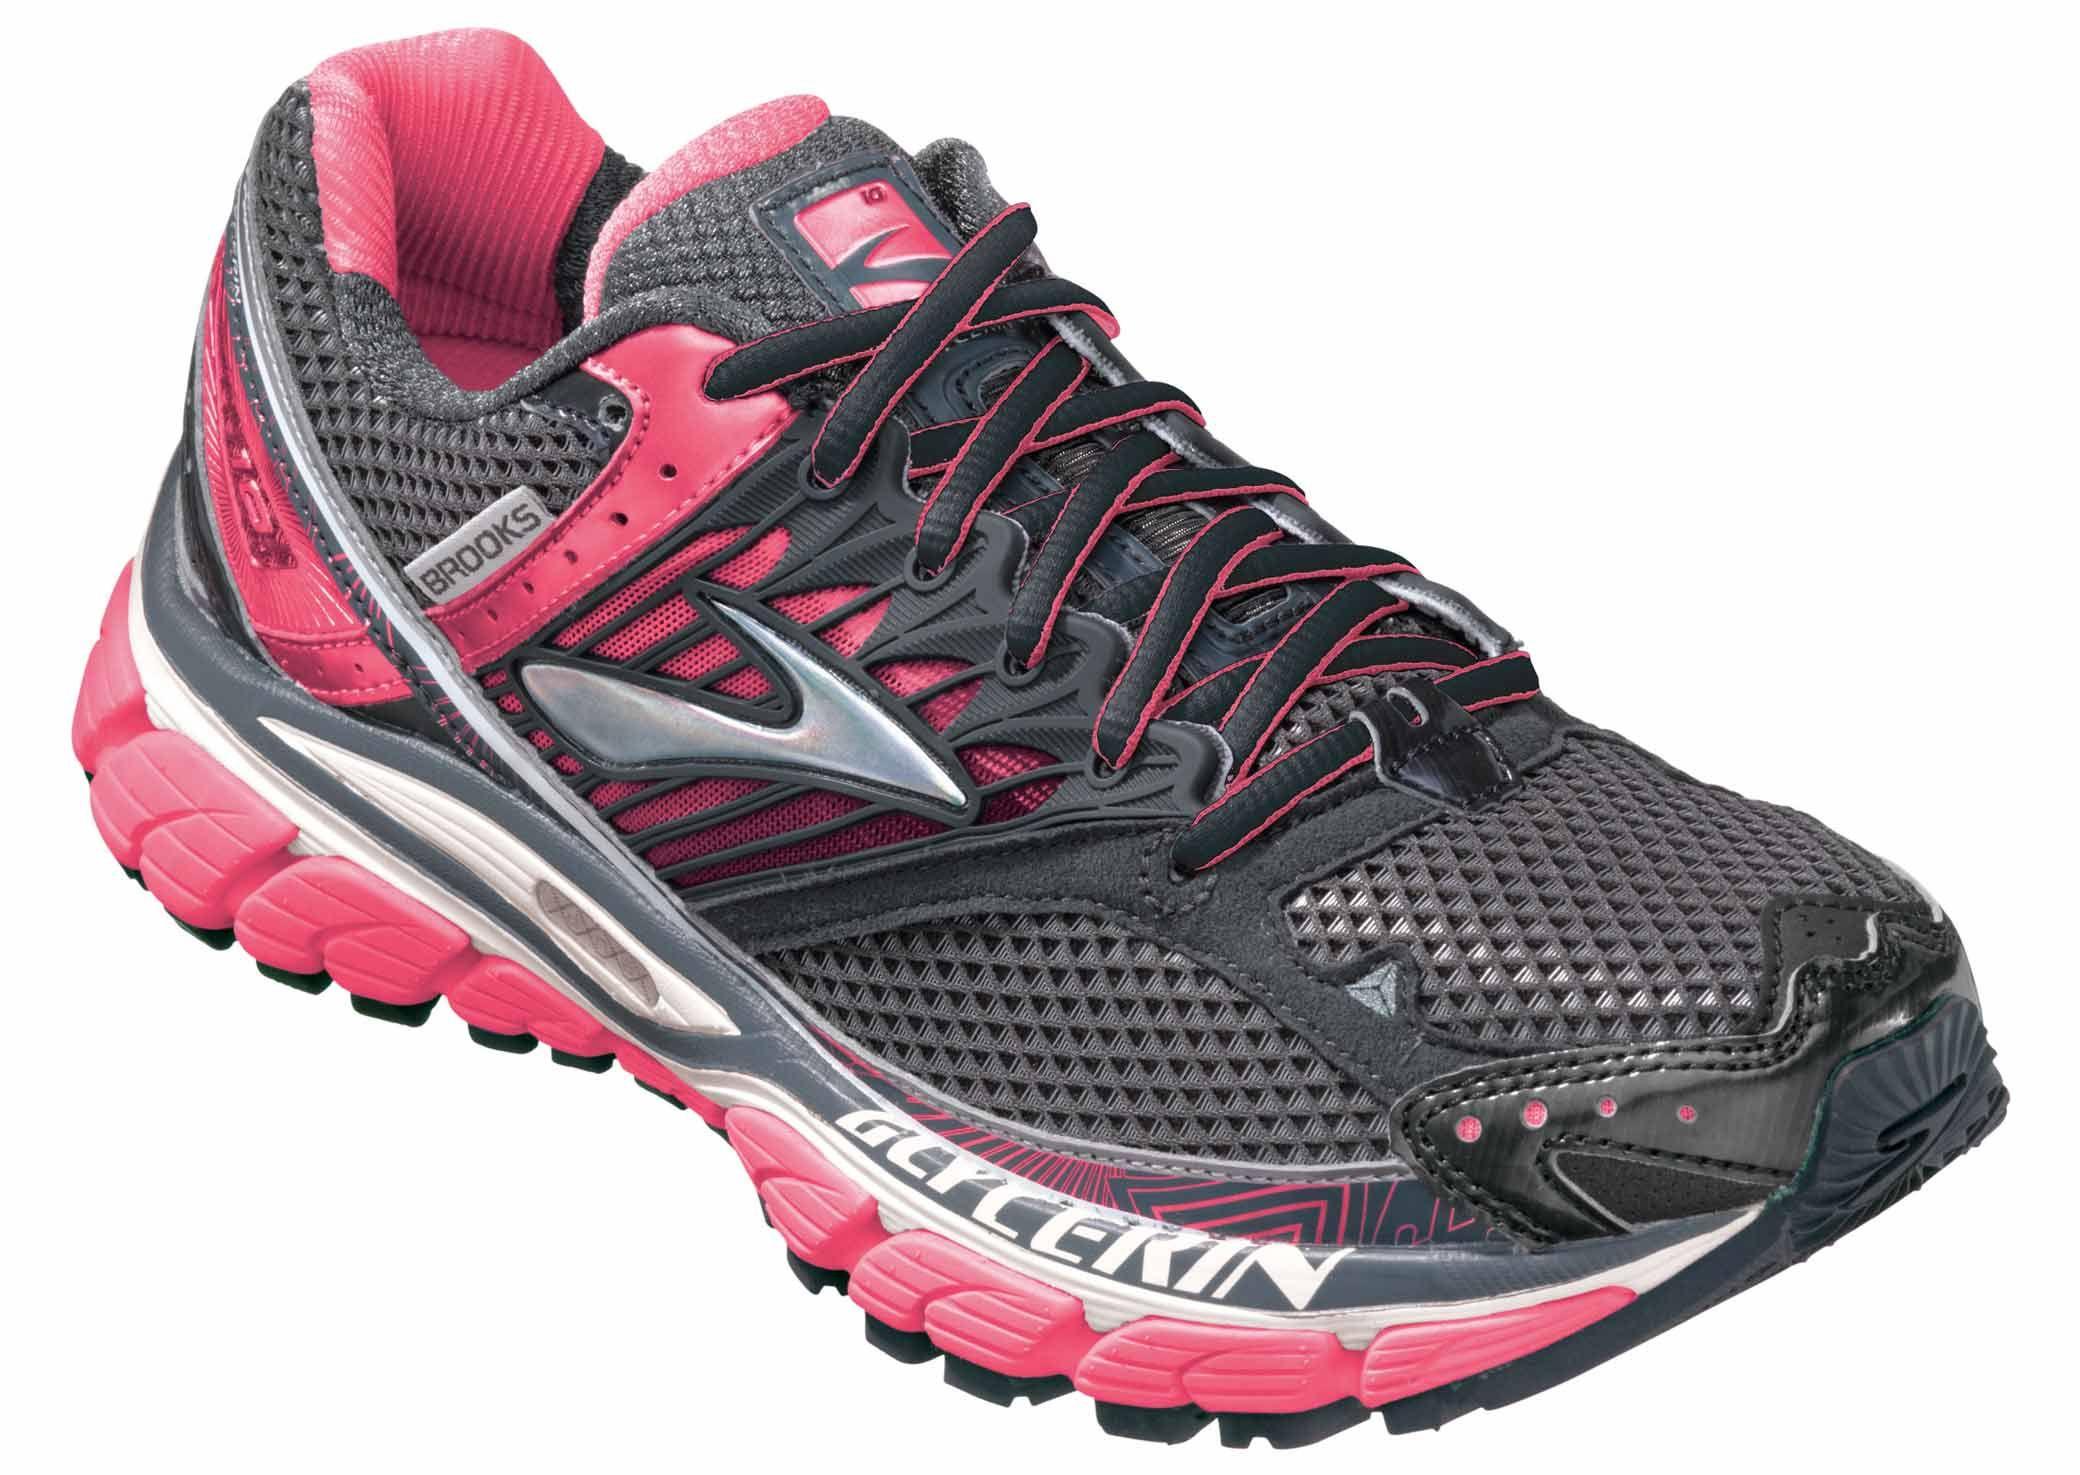 0b2fd2be72f Brooks Glycerin 10  Brooks premier women s neutral running shoe - with DNA